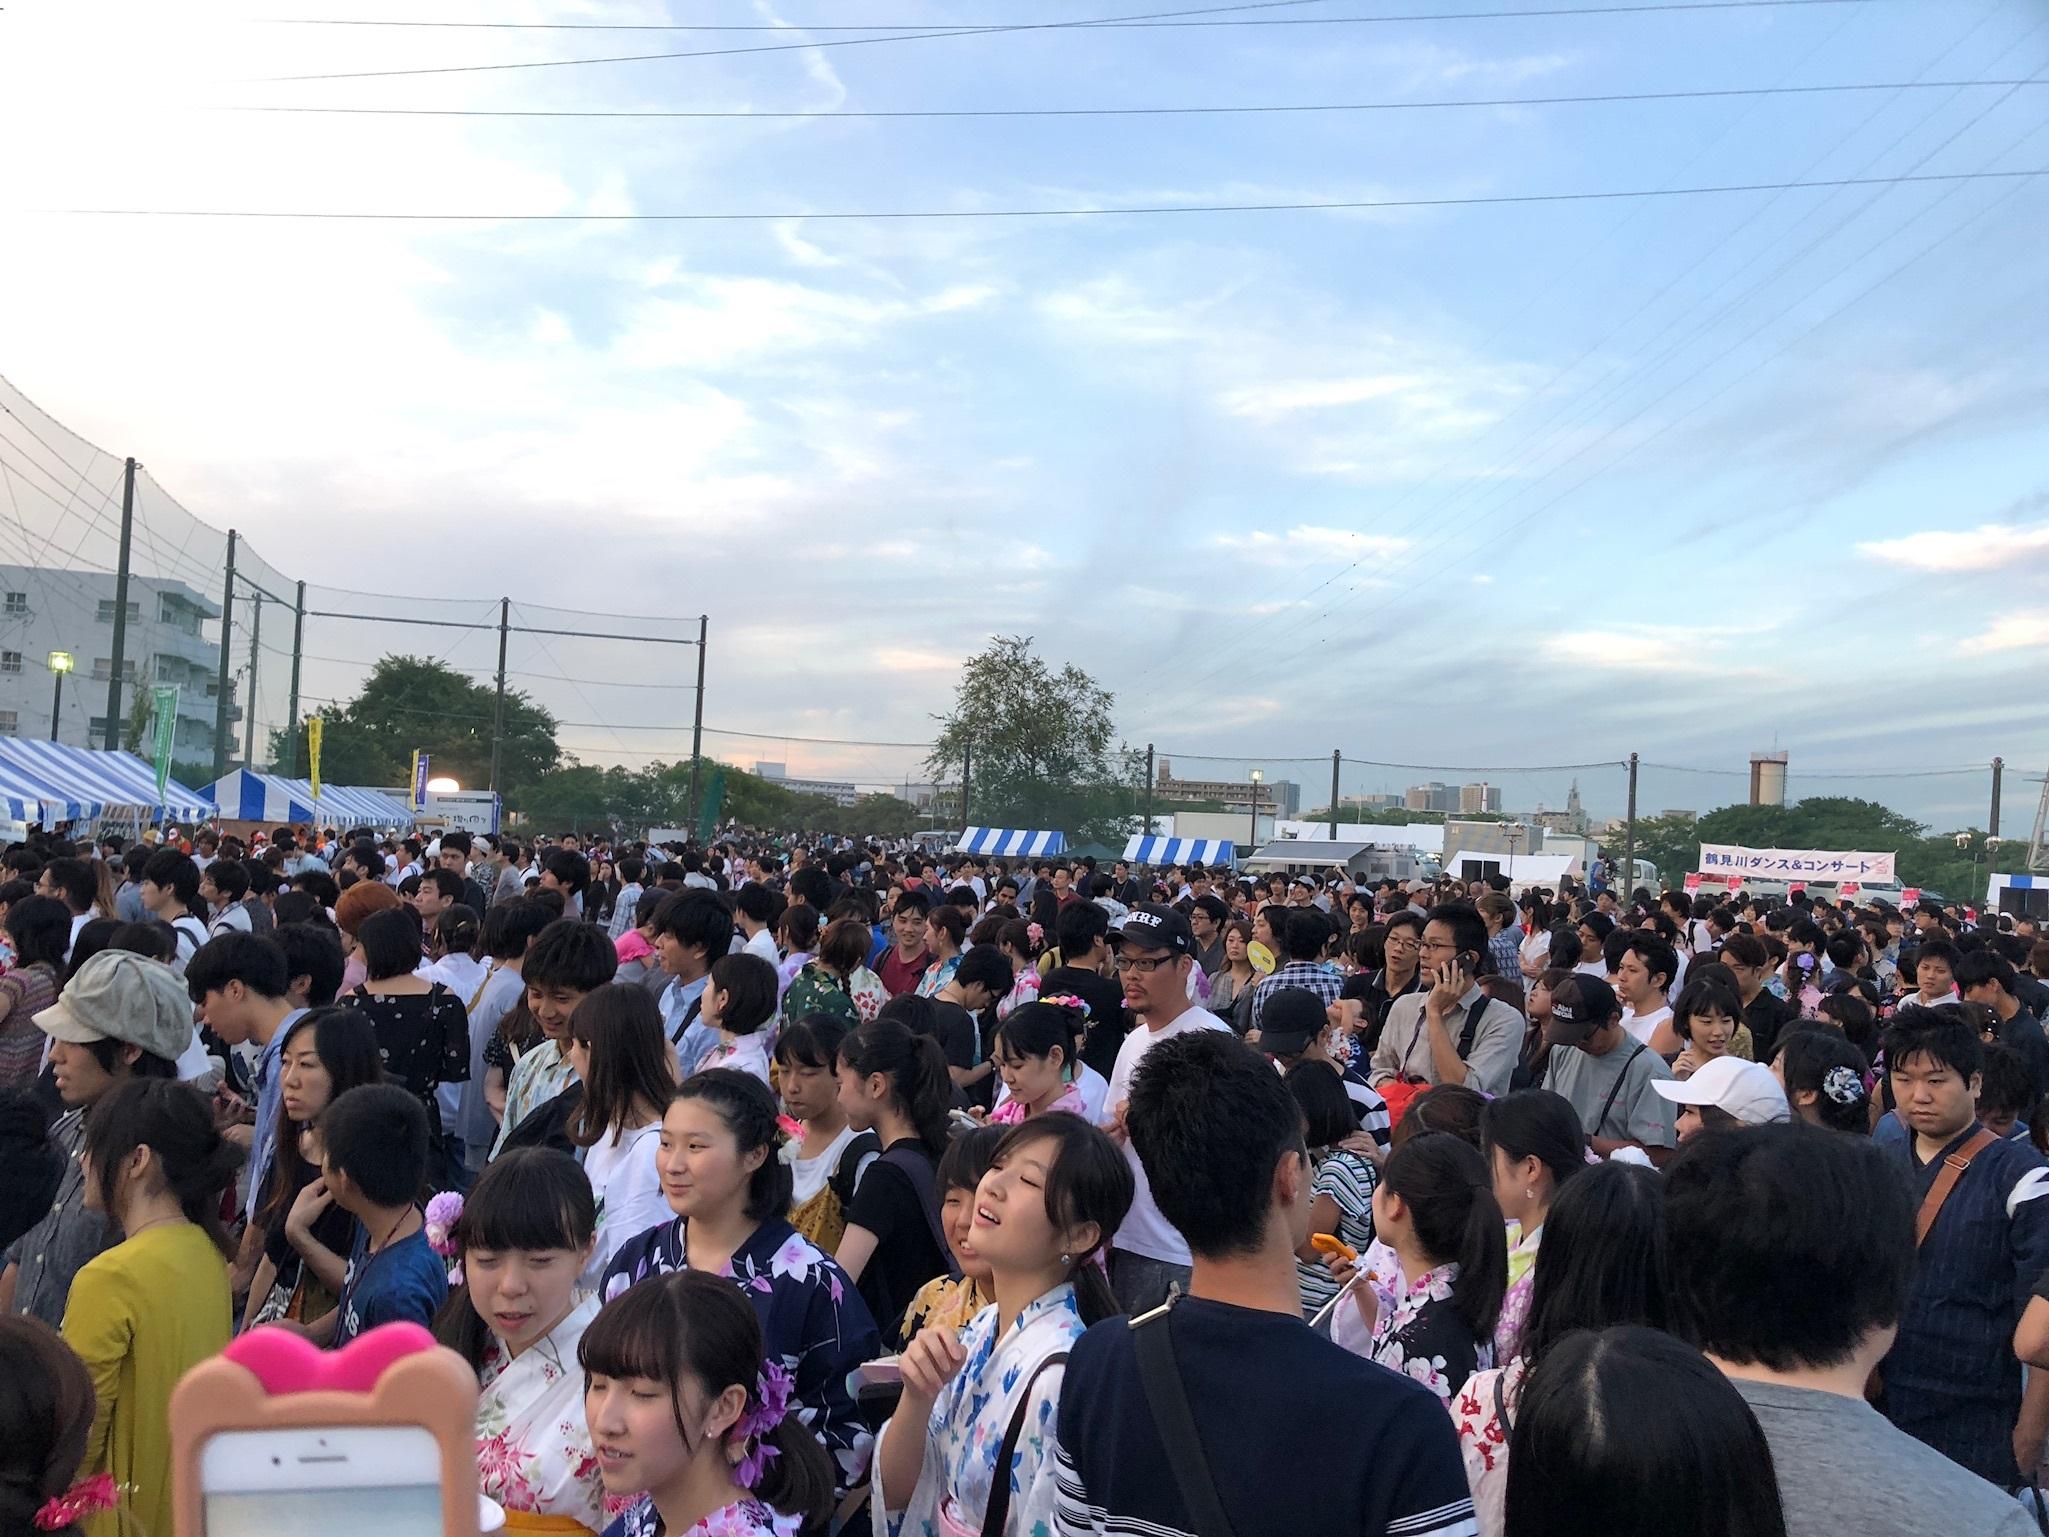 The crowd at the Tsurumi firework festival.